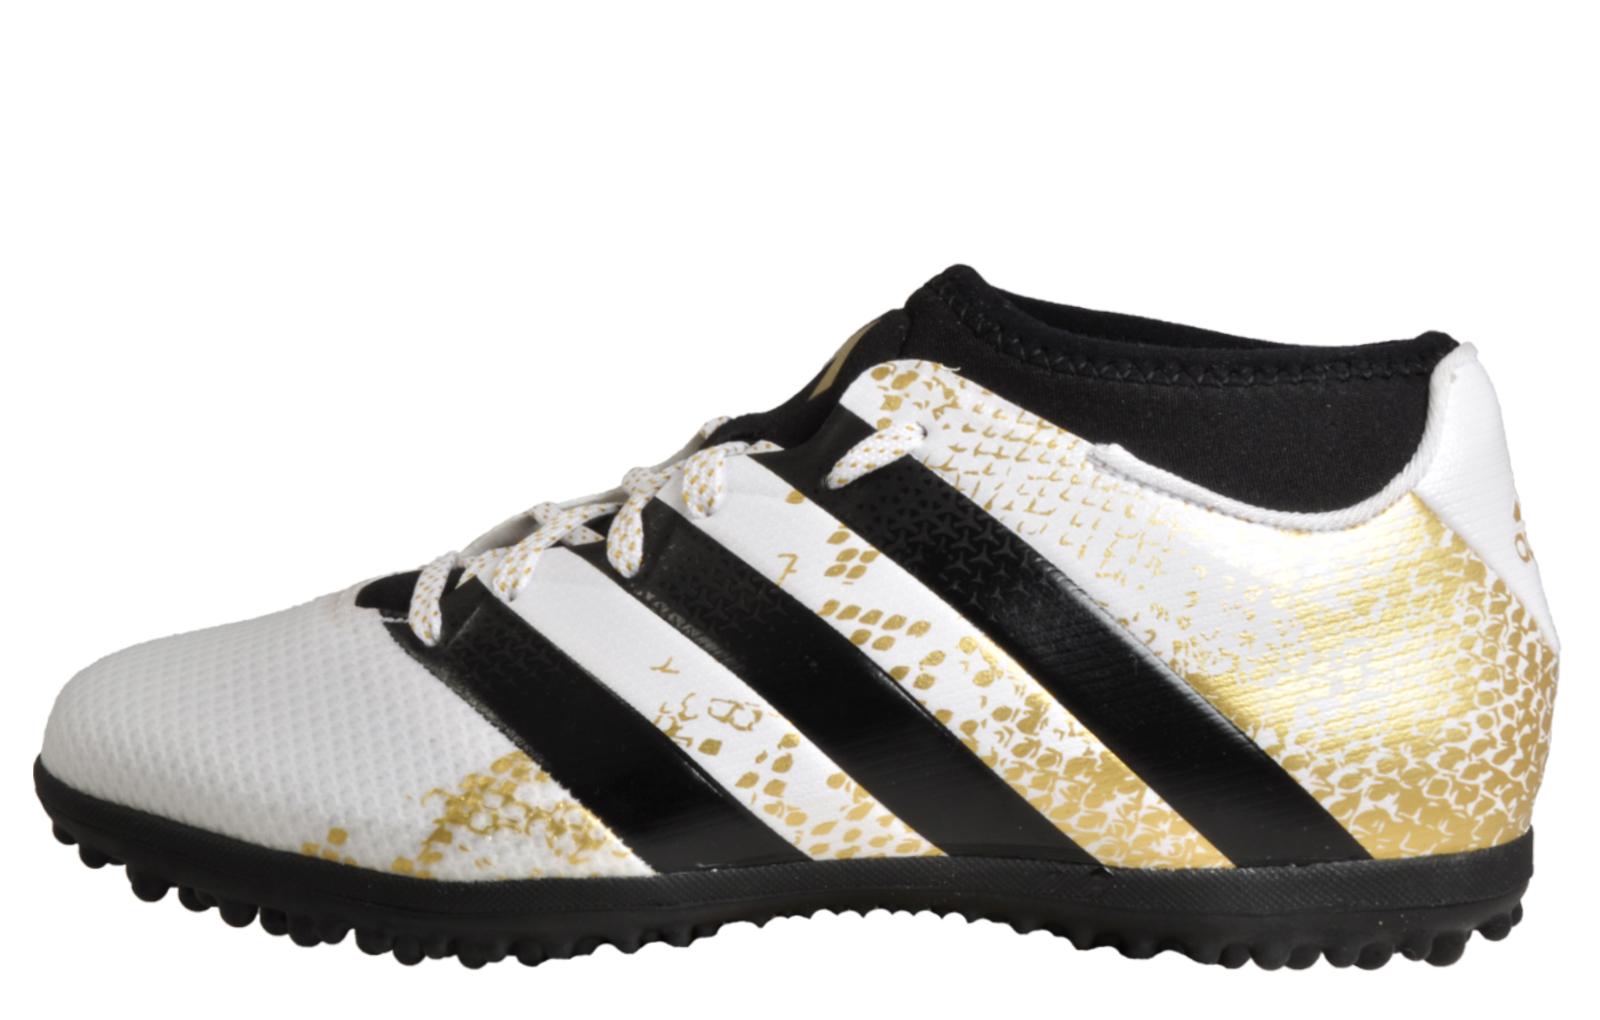 9d80a3e12b2 White   Gold   Black. Adidas Ace 16.3 Primemesh TF Mens - AD170704